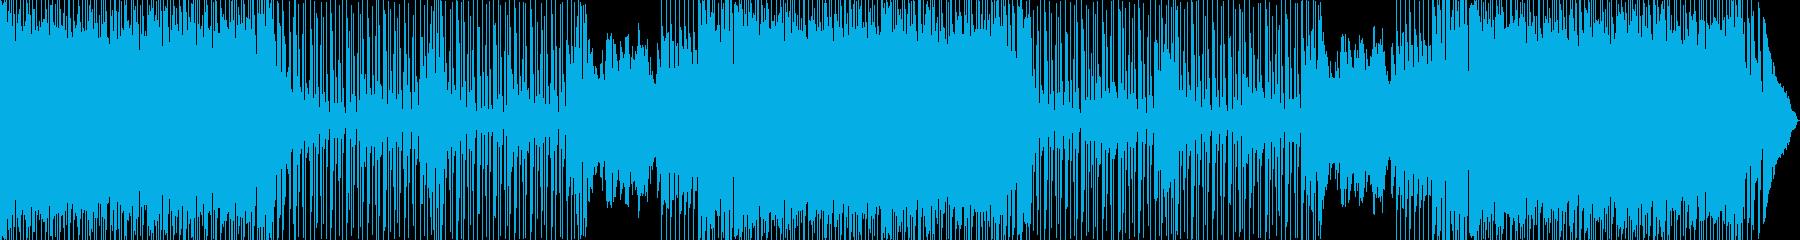 【Jpop】ロックなジミーの再生済みの波形